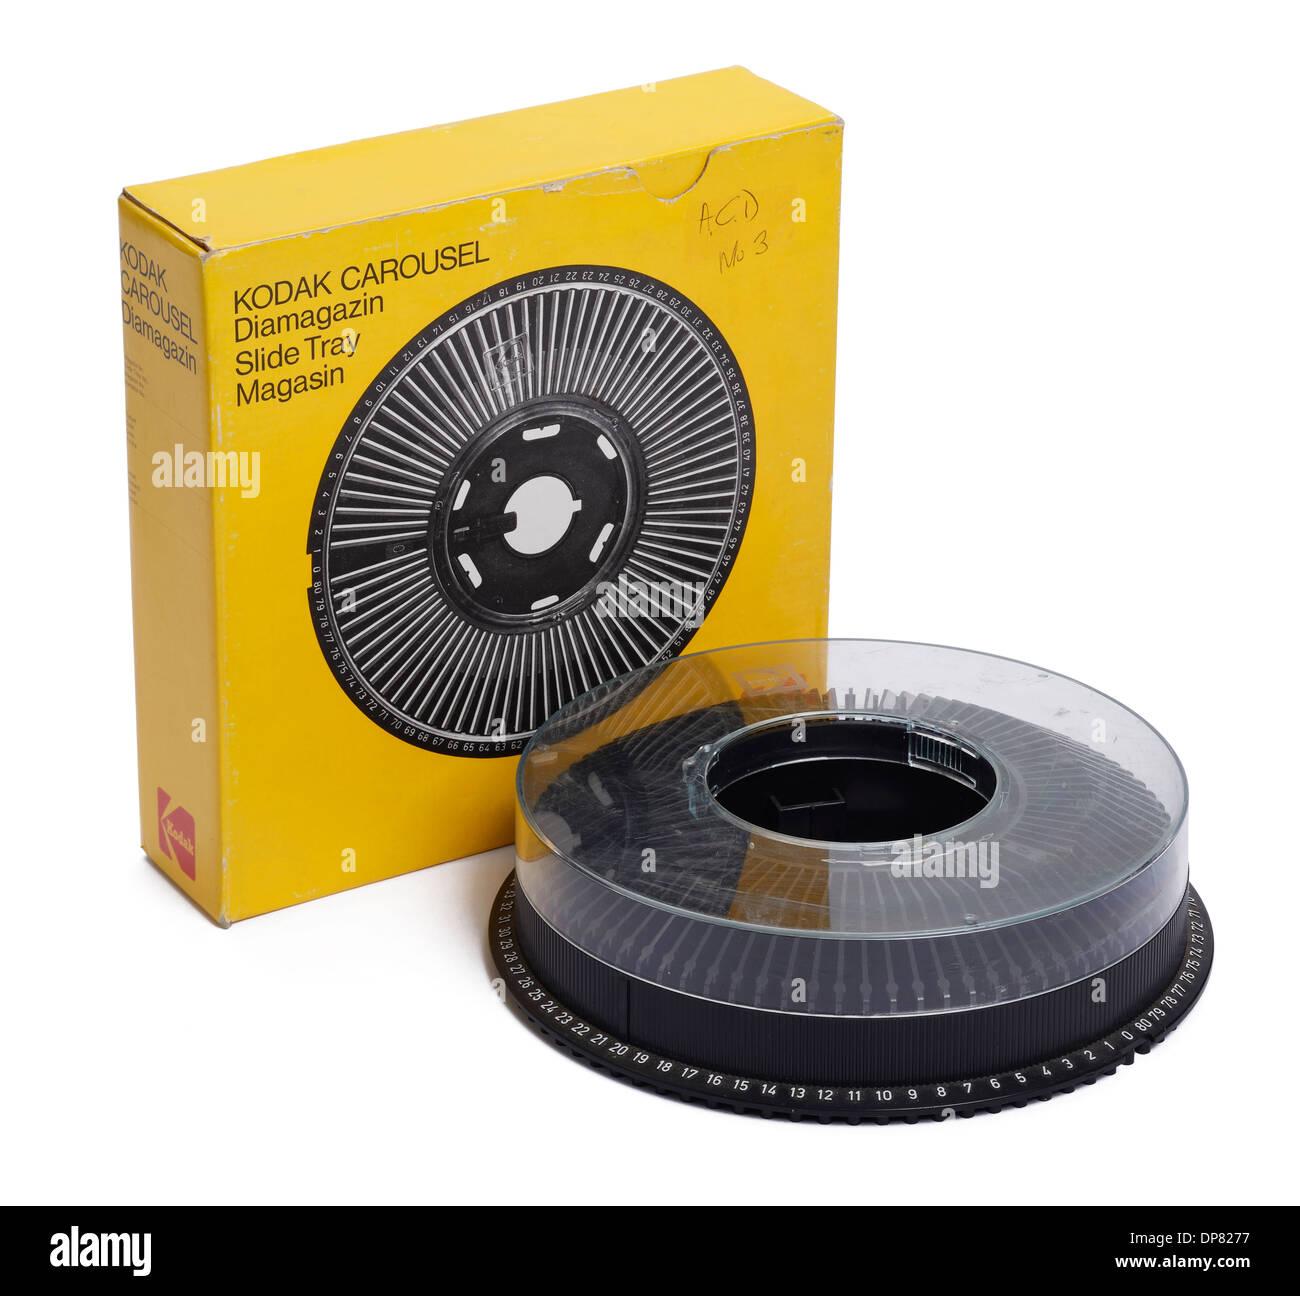 Kodak Carousel circular slide tray and box for a slide projector - Stock Image